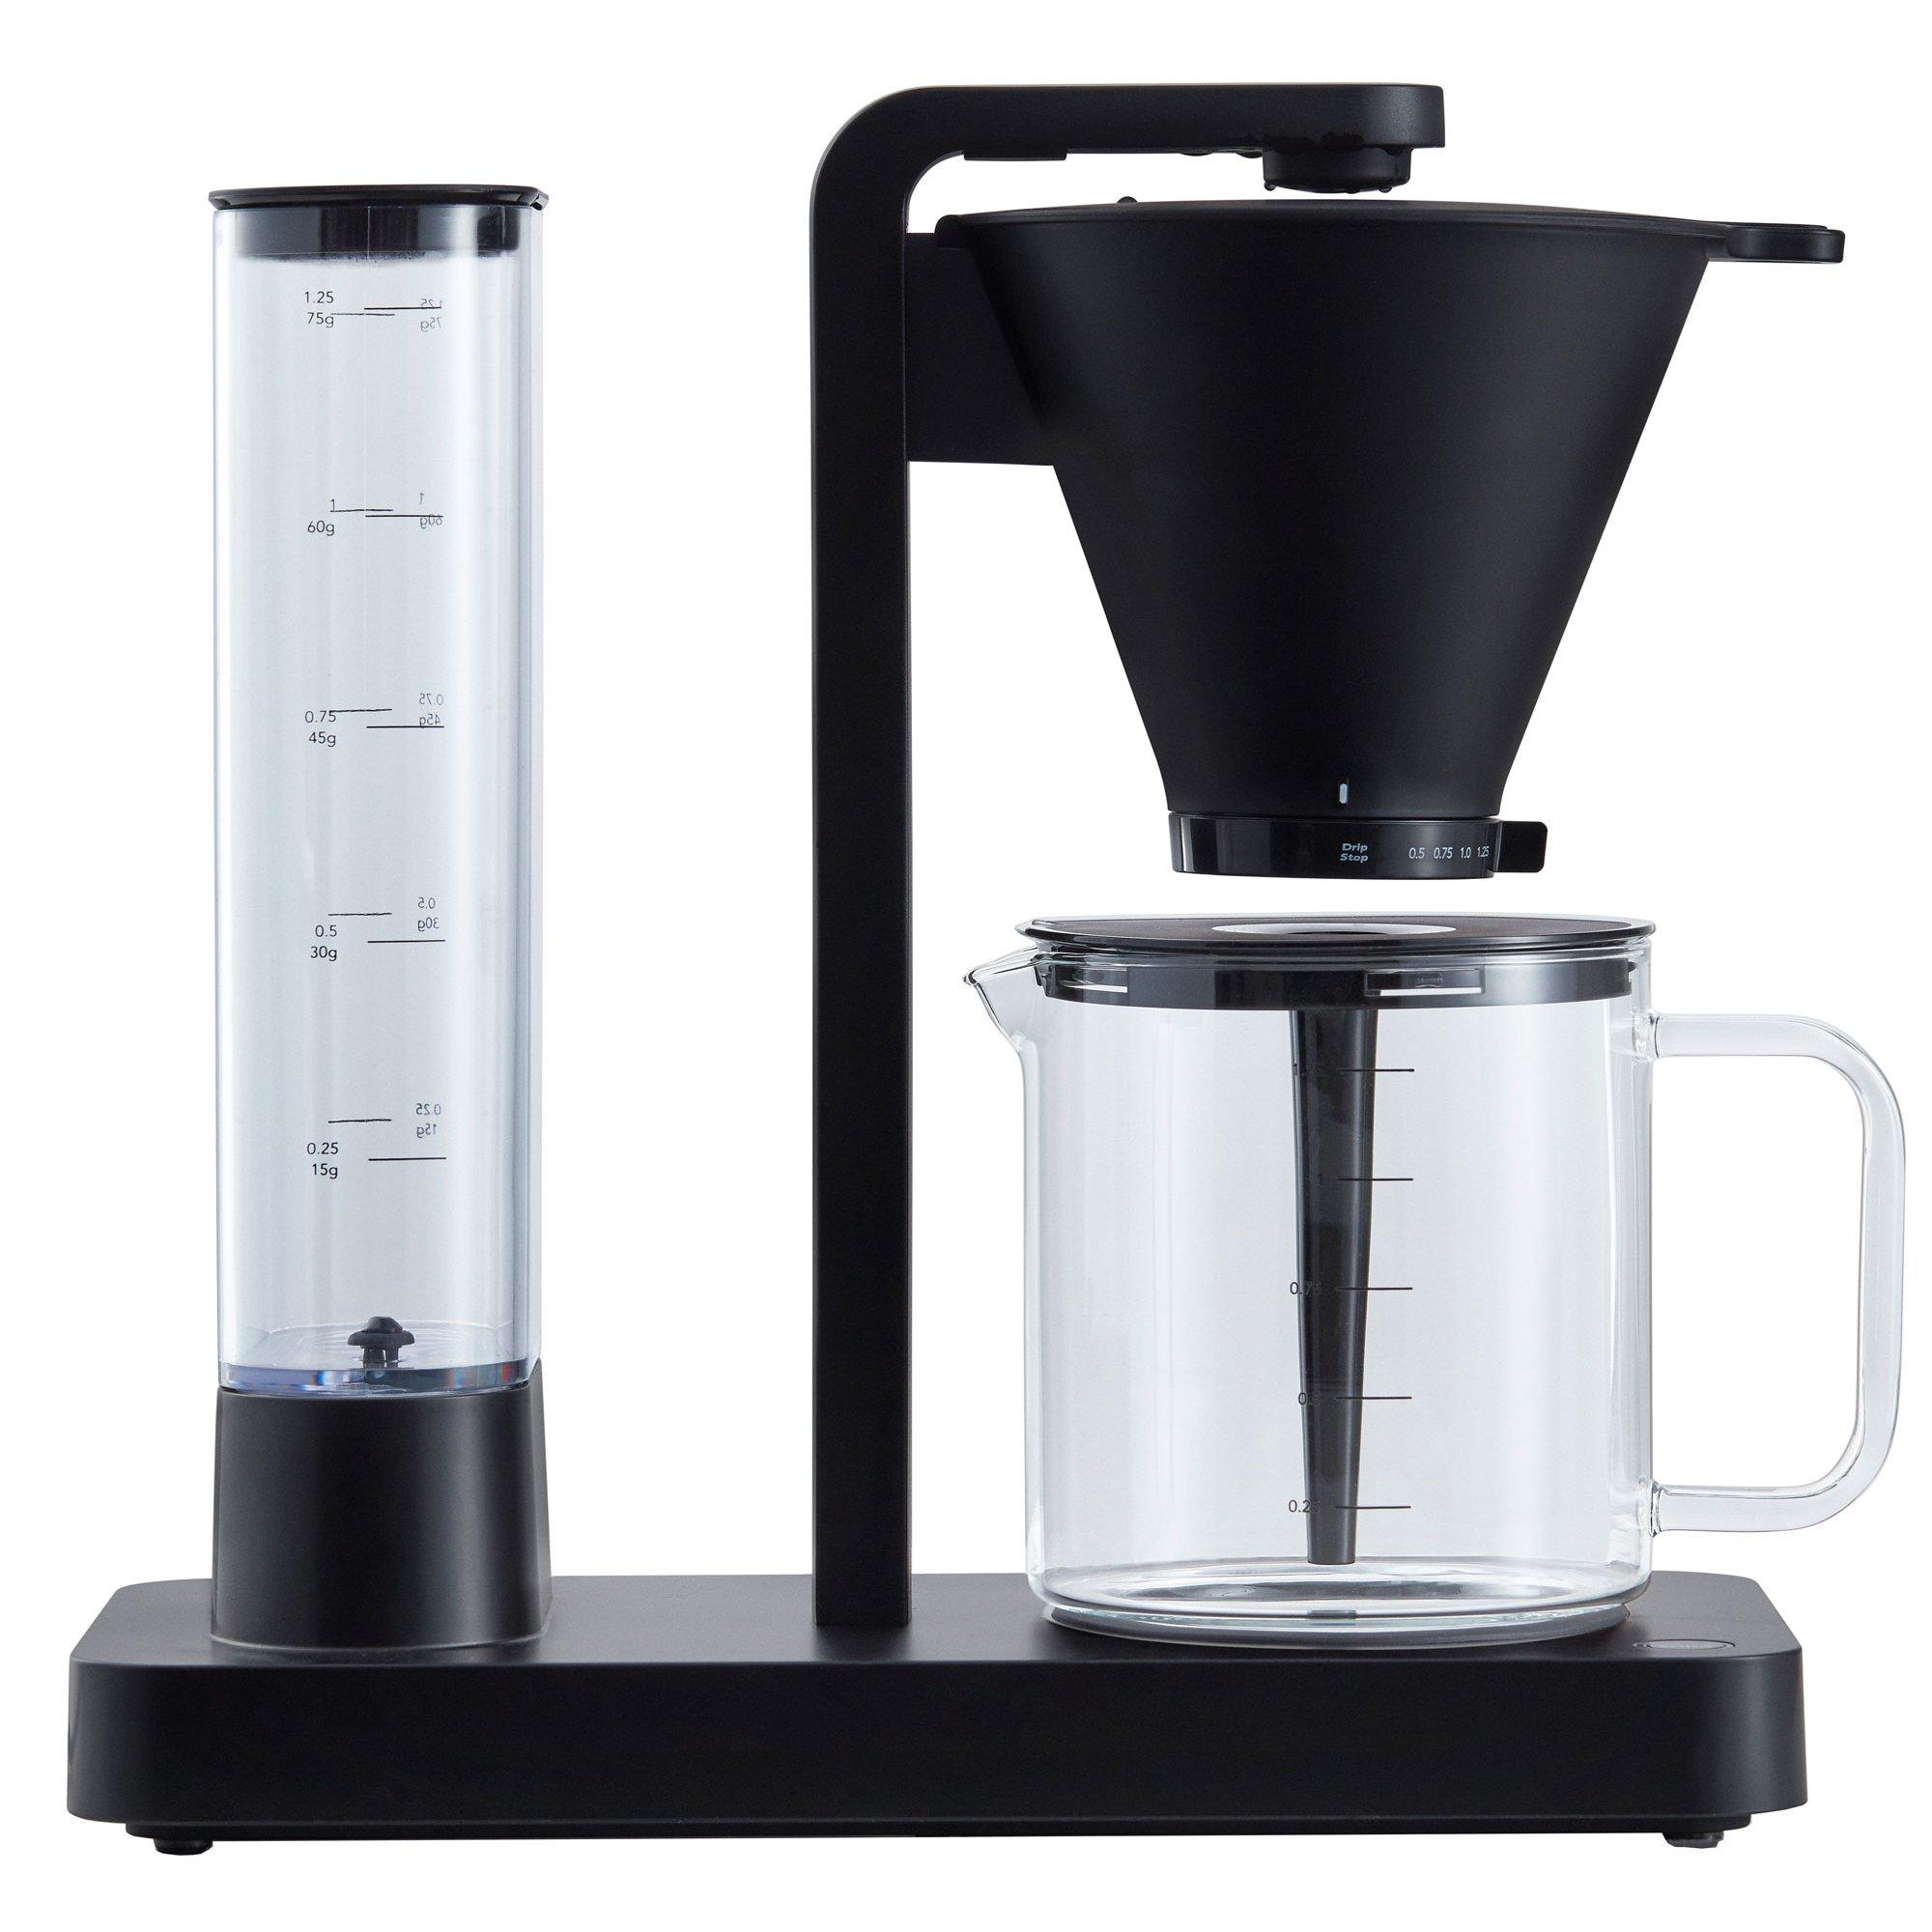 Wilfa WSPL-3B Performance kaffebryggare